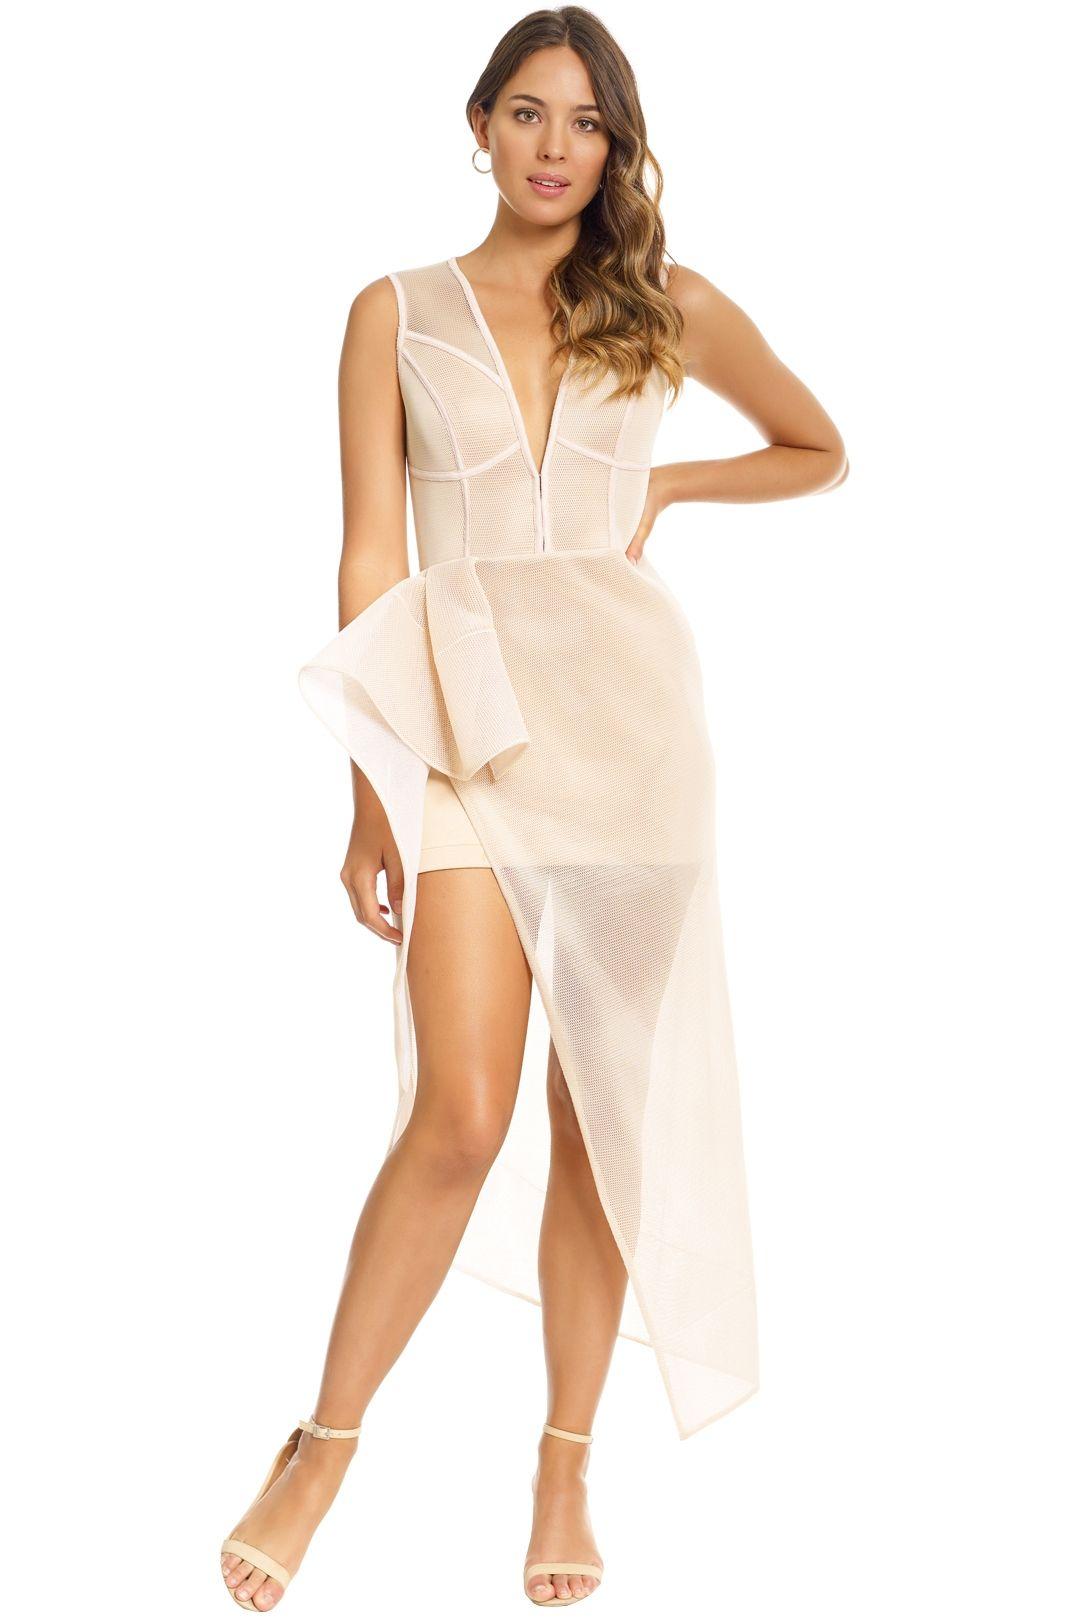 Lexi - Prana Dress - Champagne - Front